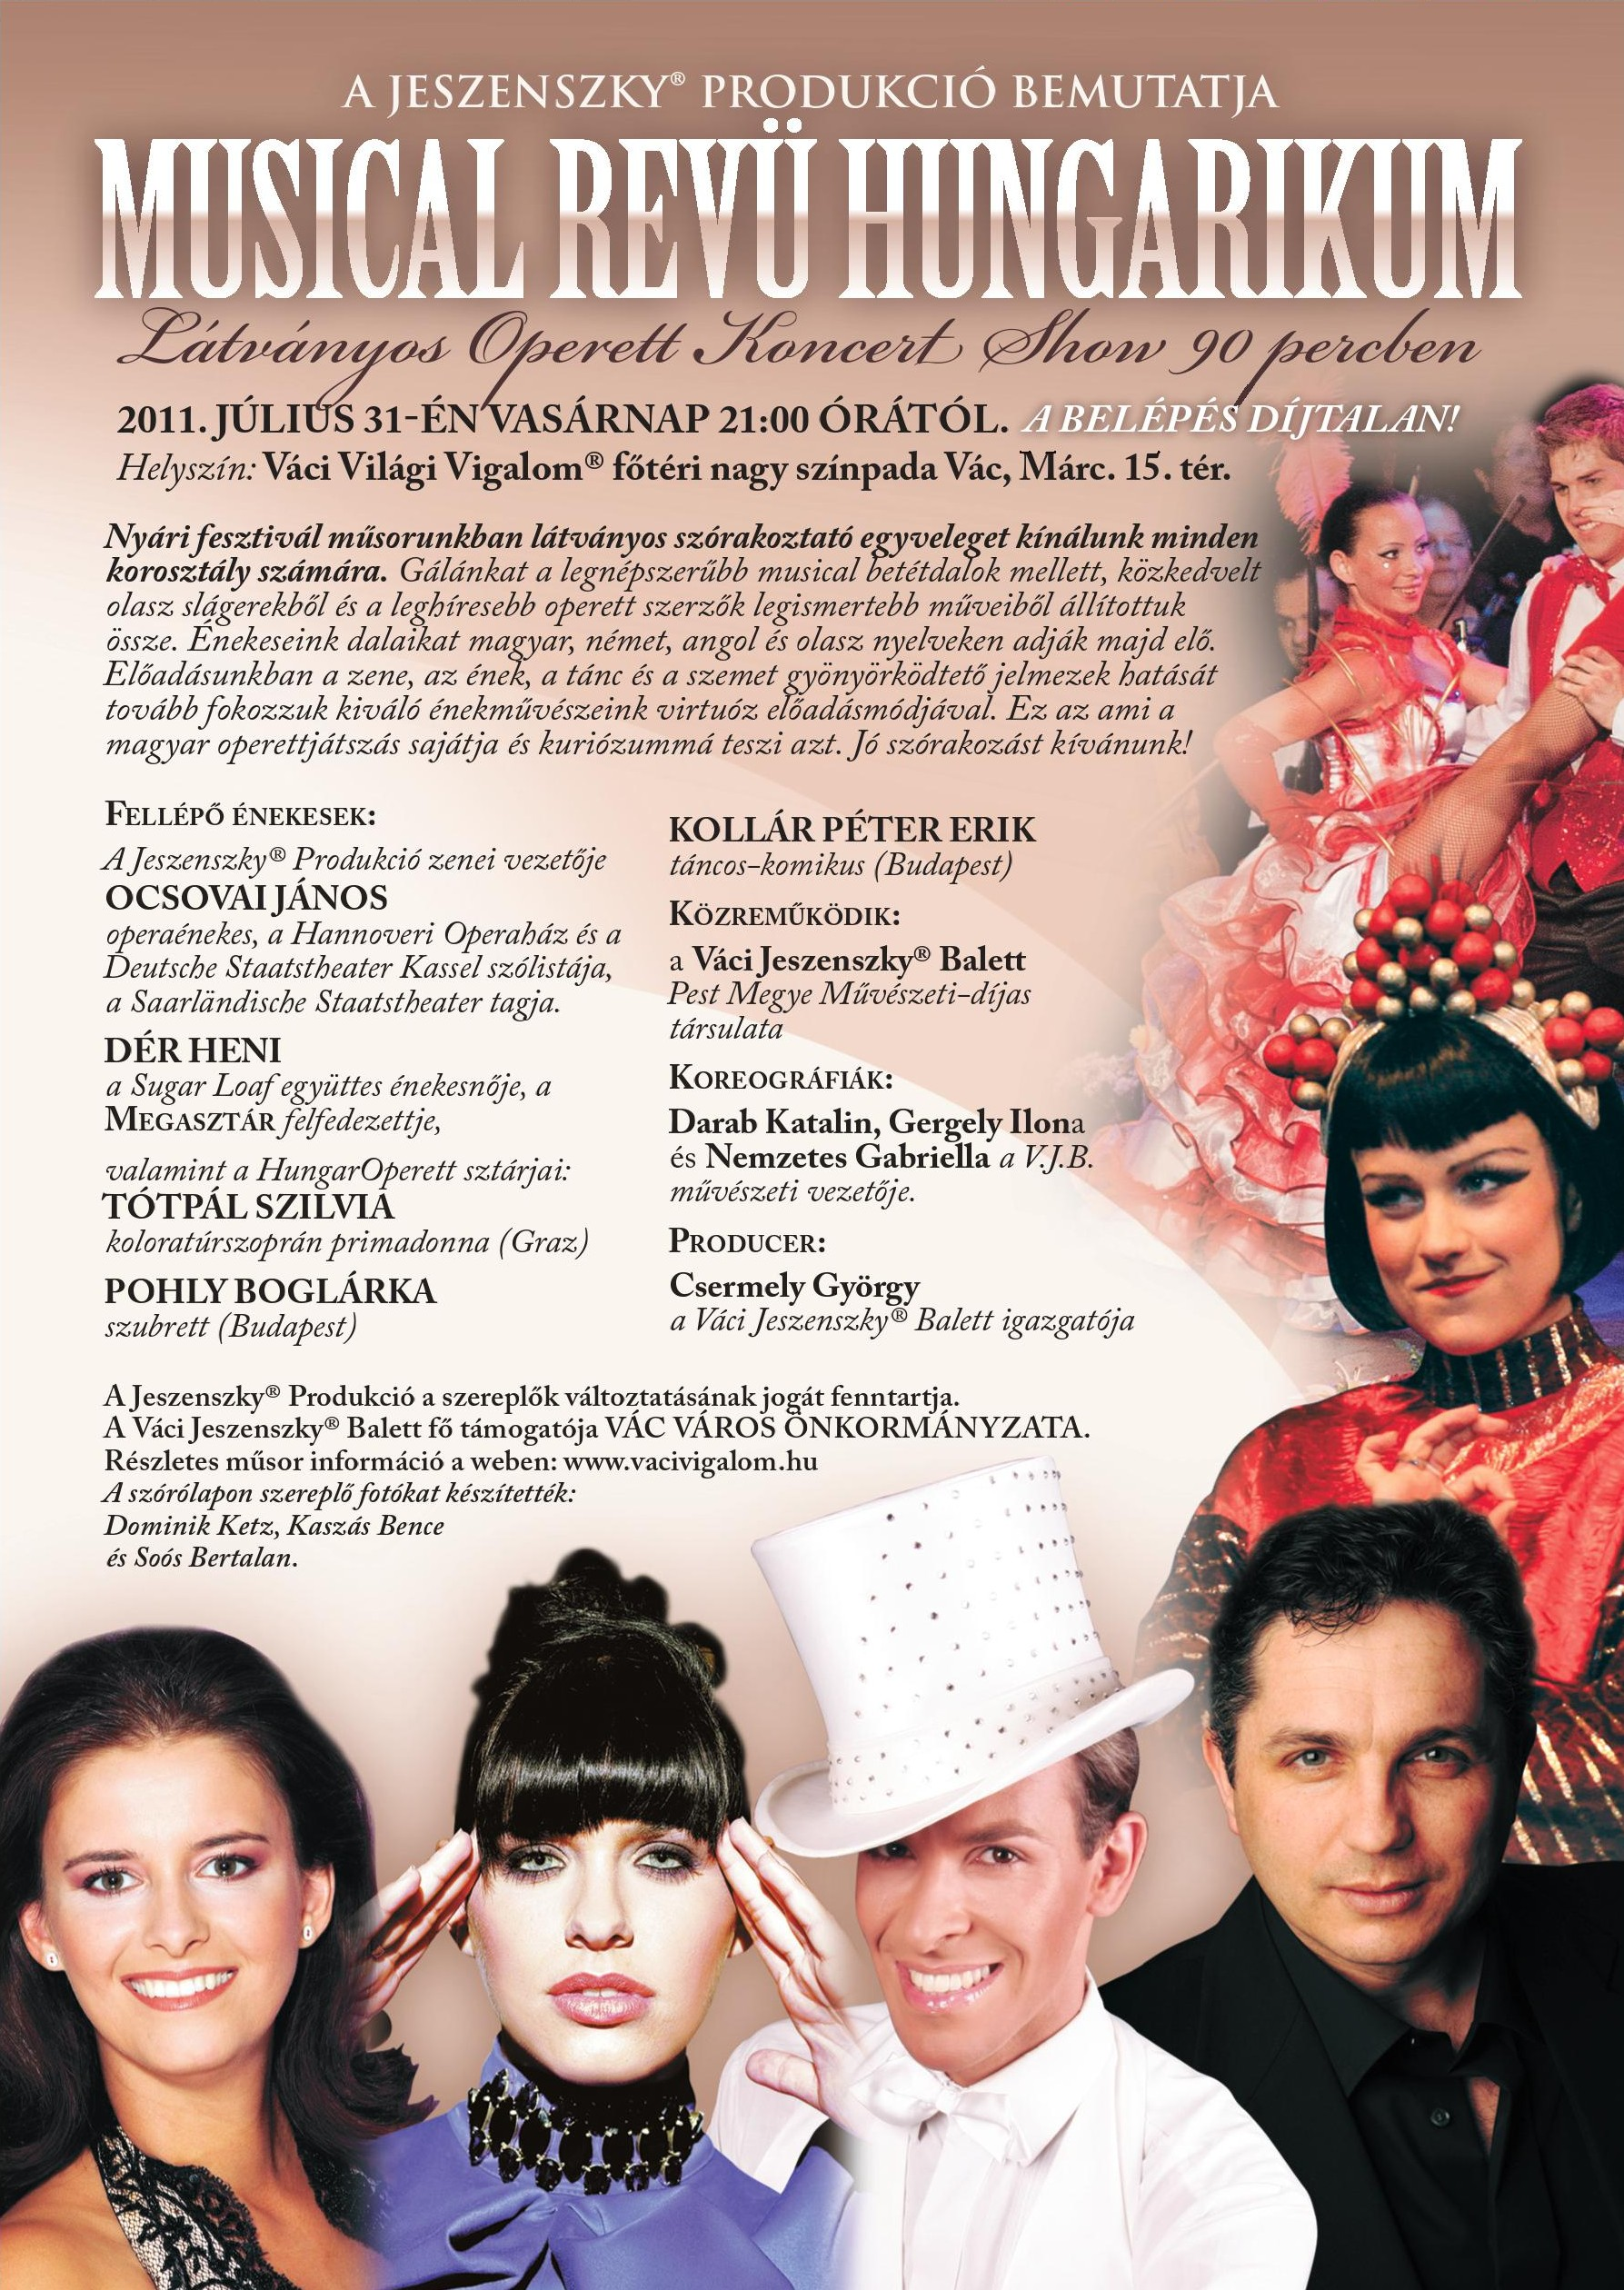 jeszenszky-vaci-balett-musica-revu-hungarikum-2